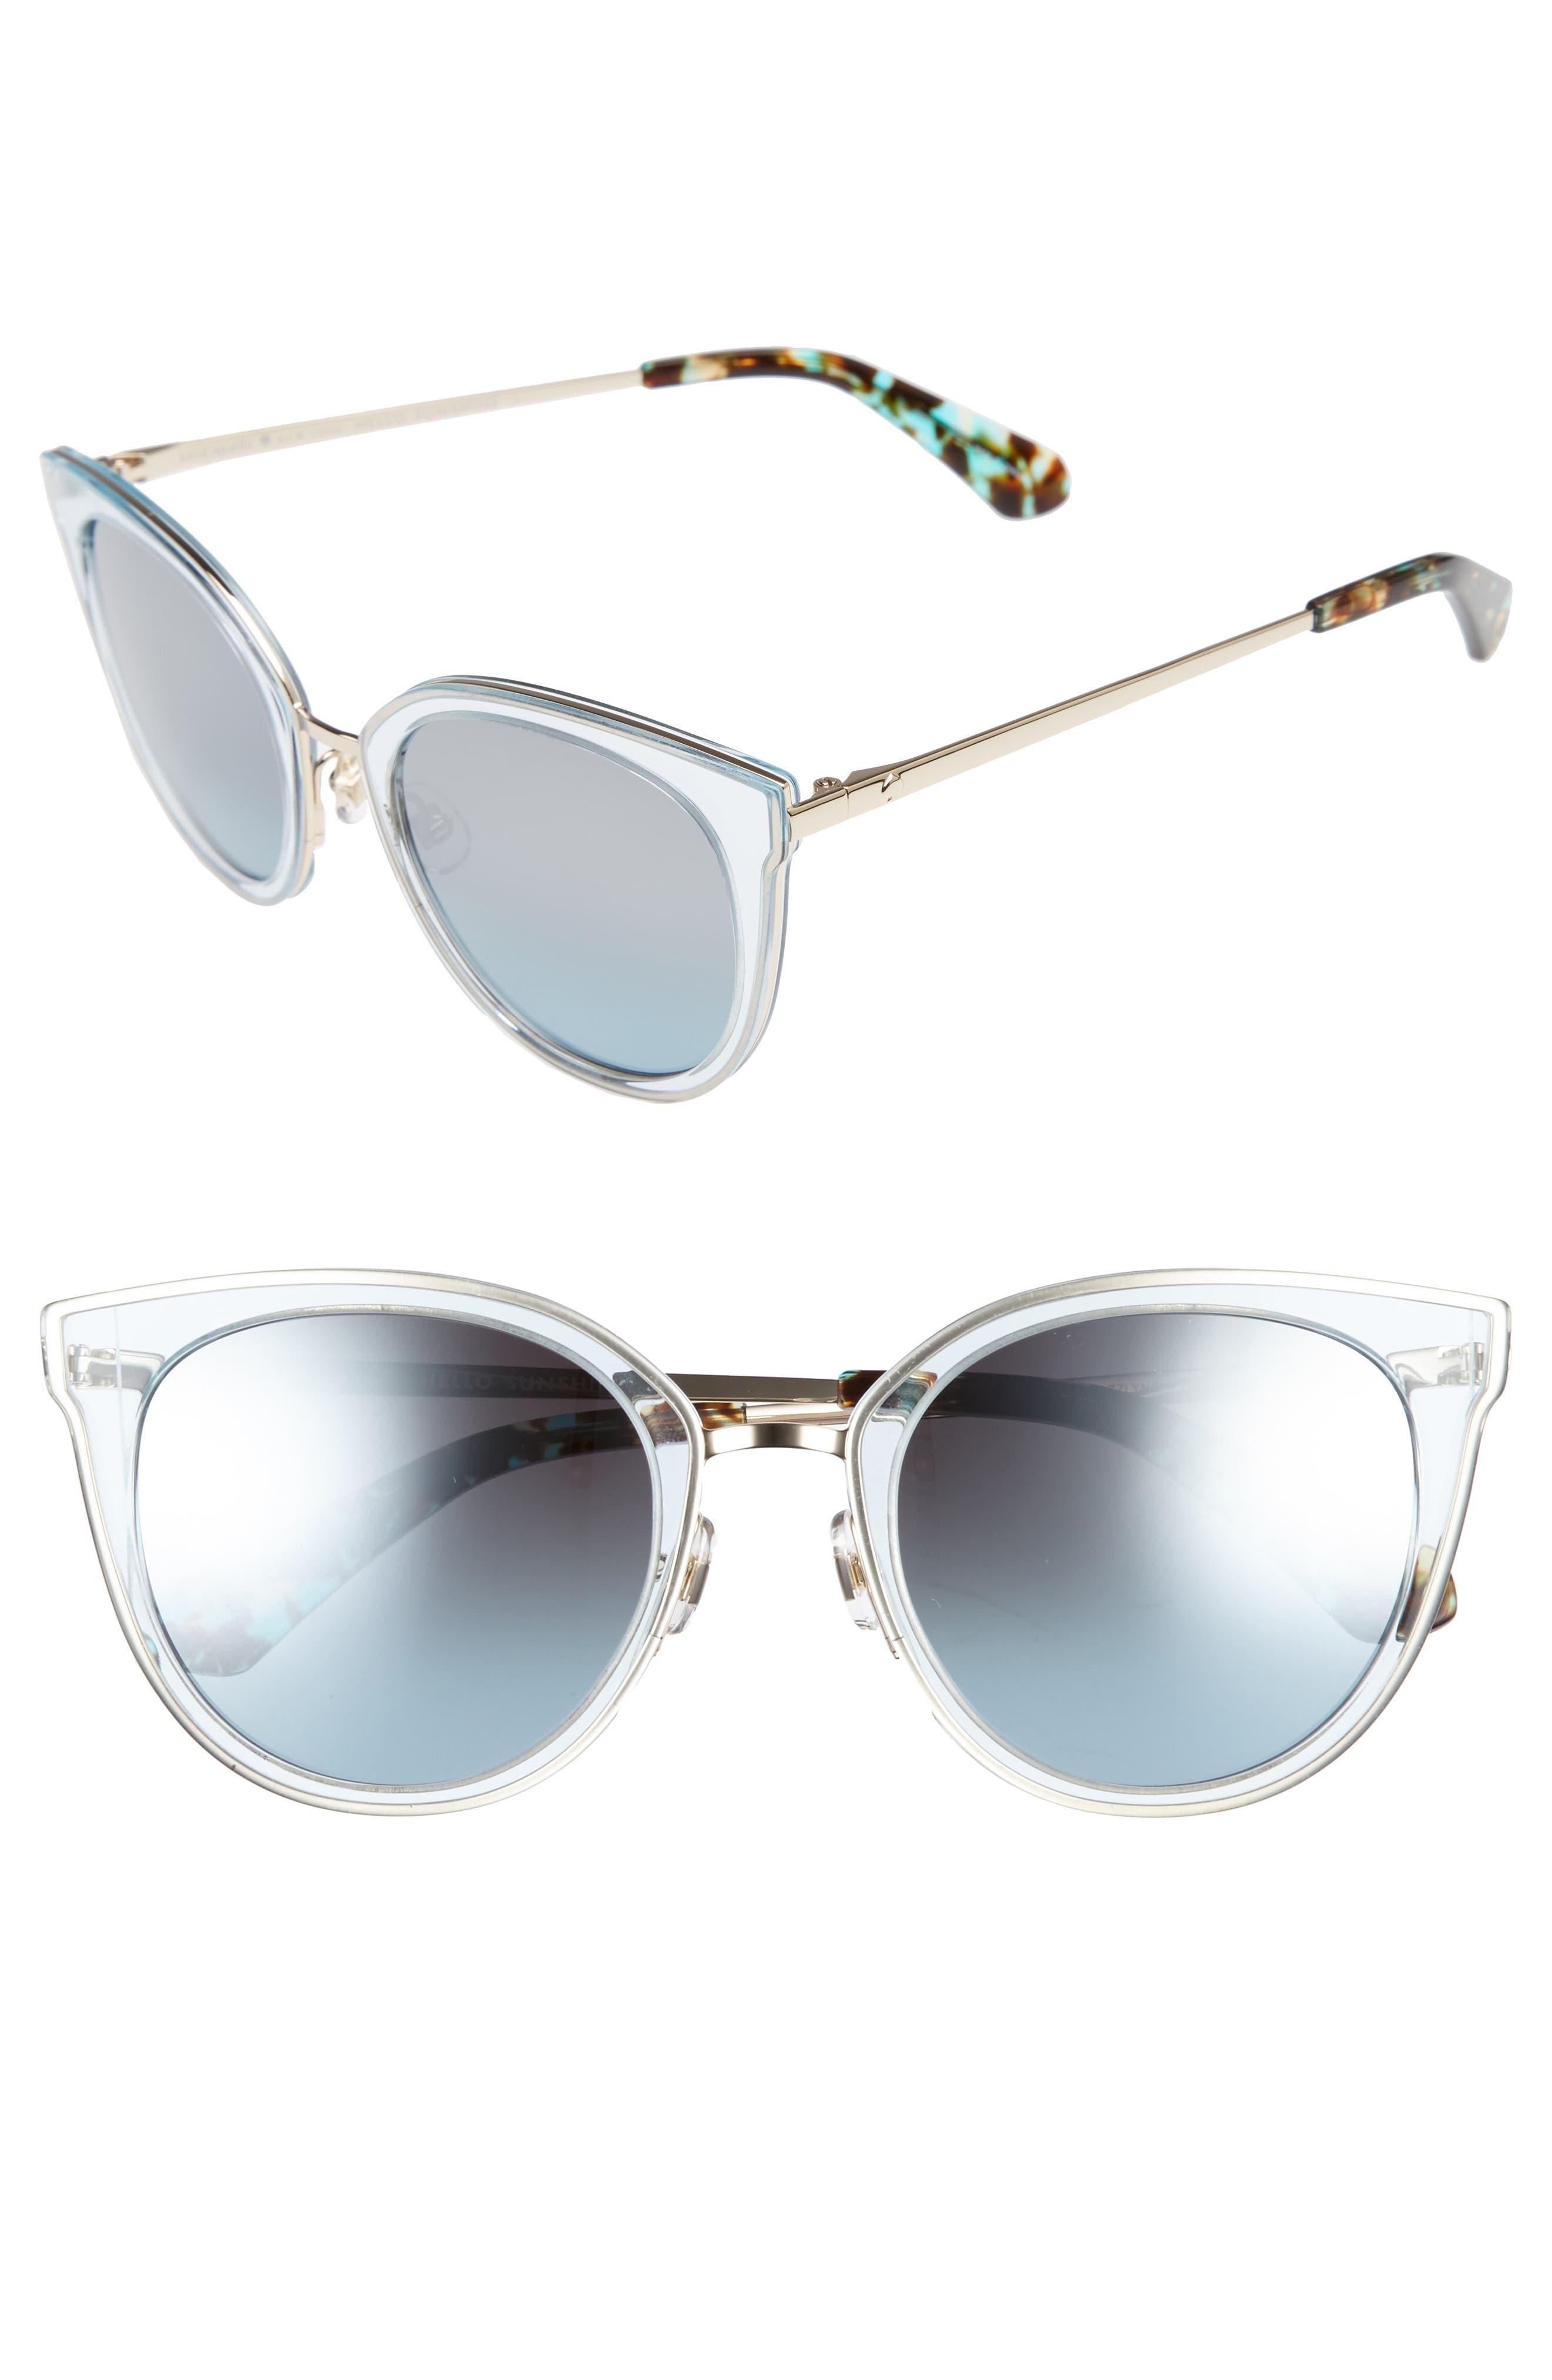 Main Image - kate spade new york jazzlyn 51mm Cat Eye Sunglasses